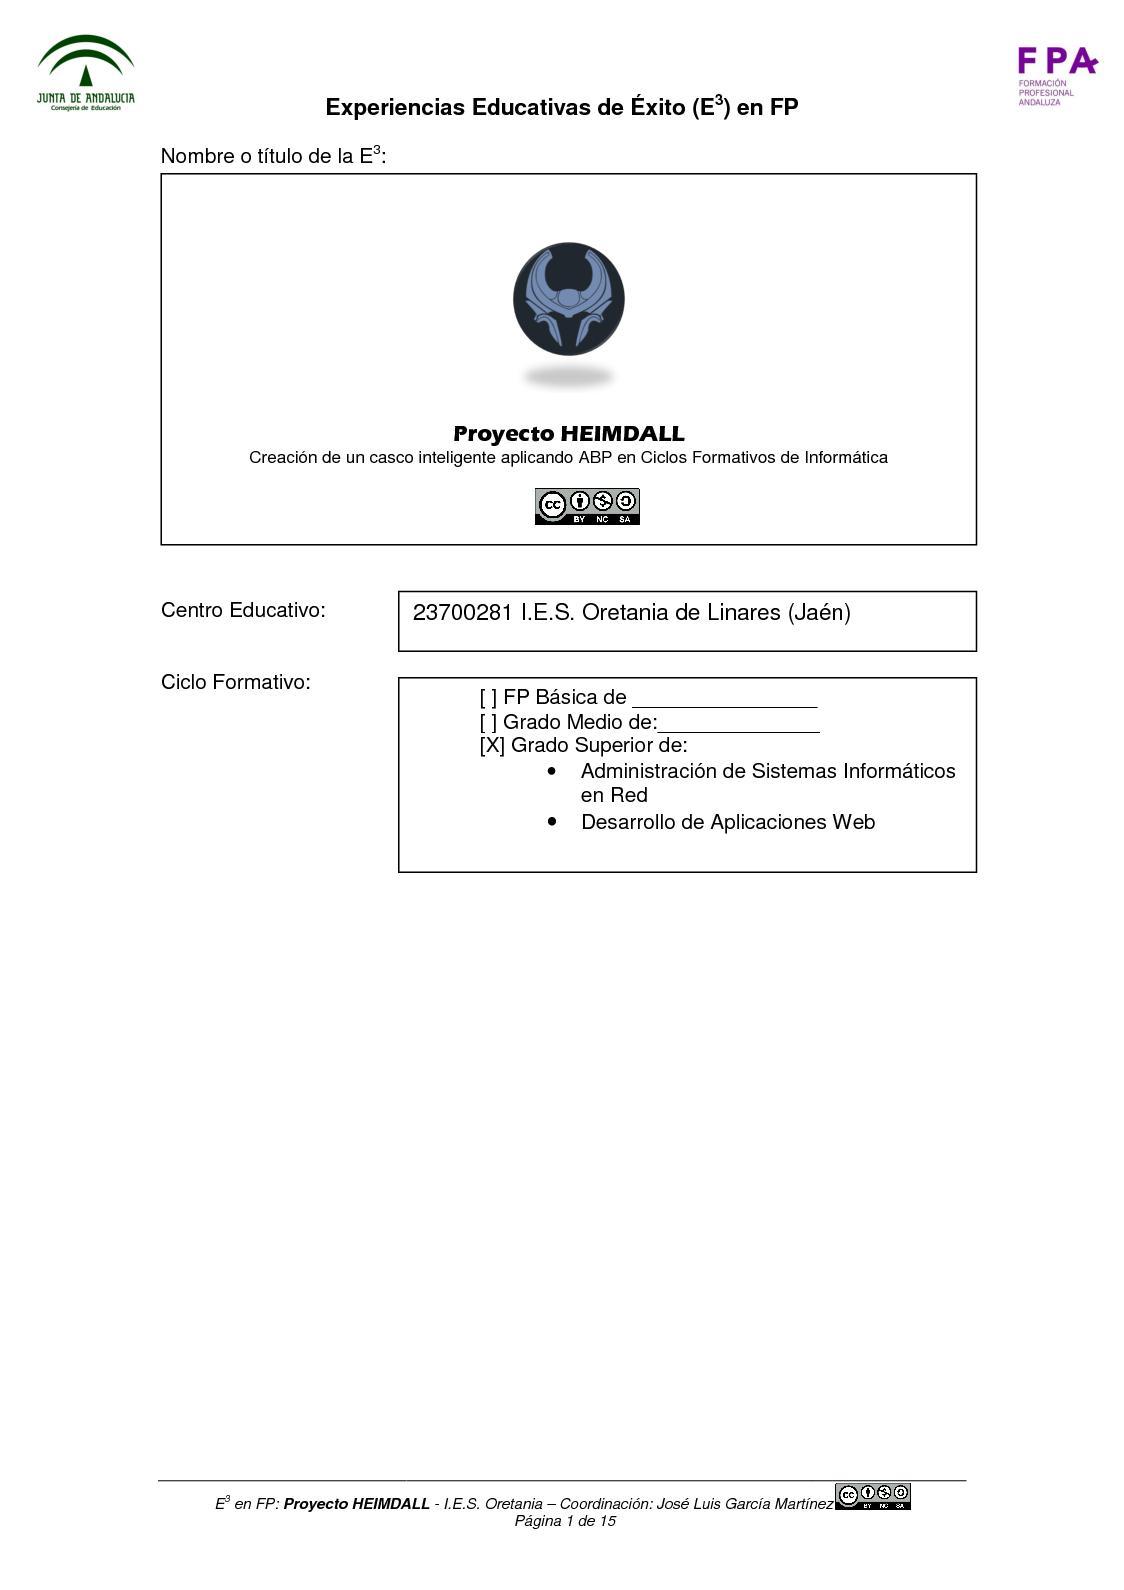 Calaméo Ficha Experiencia Educativa Proyecto Heimdall Abp